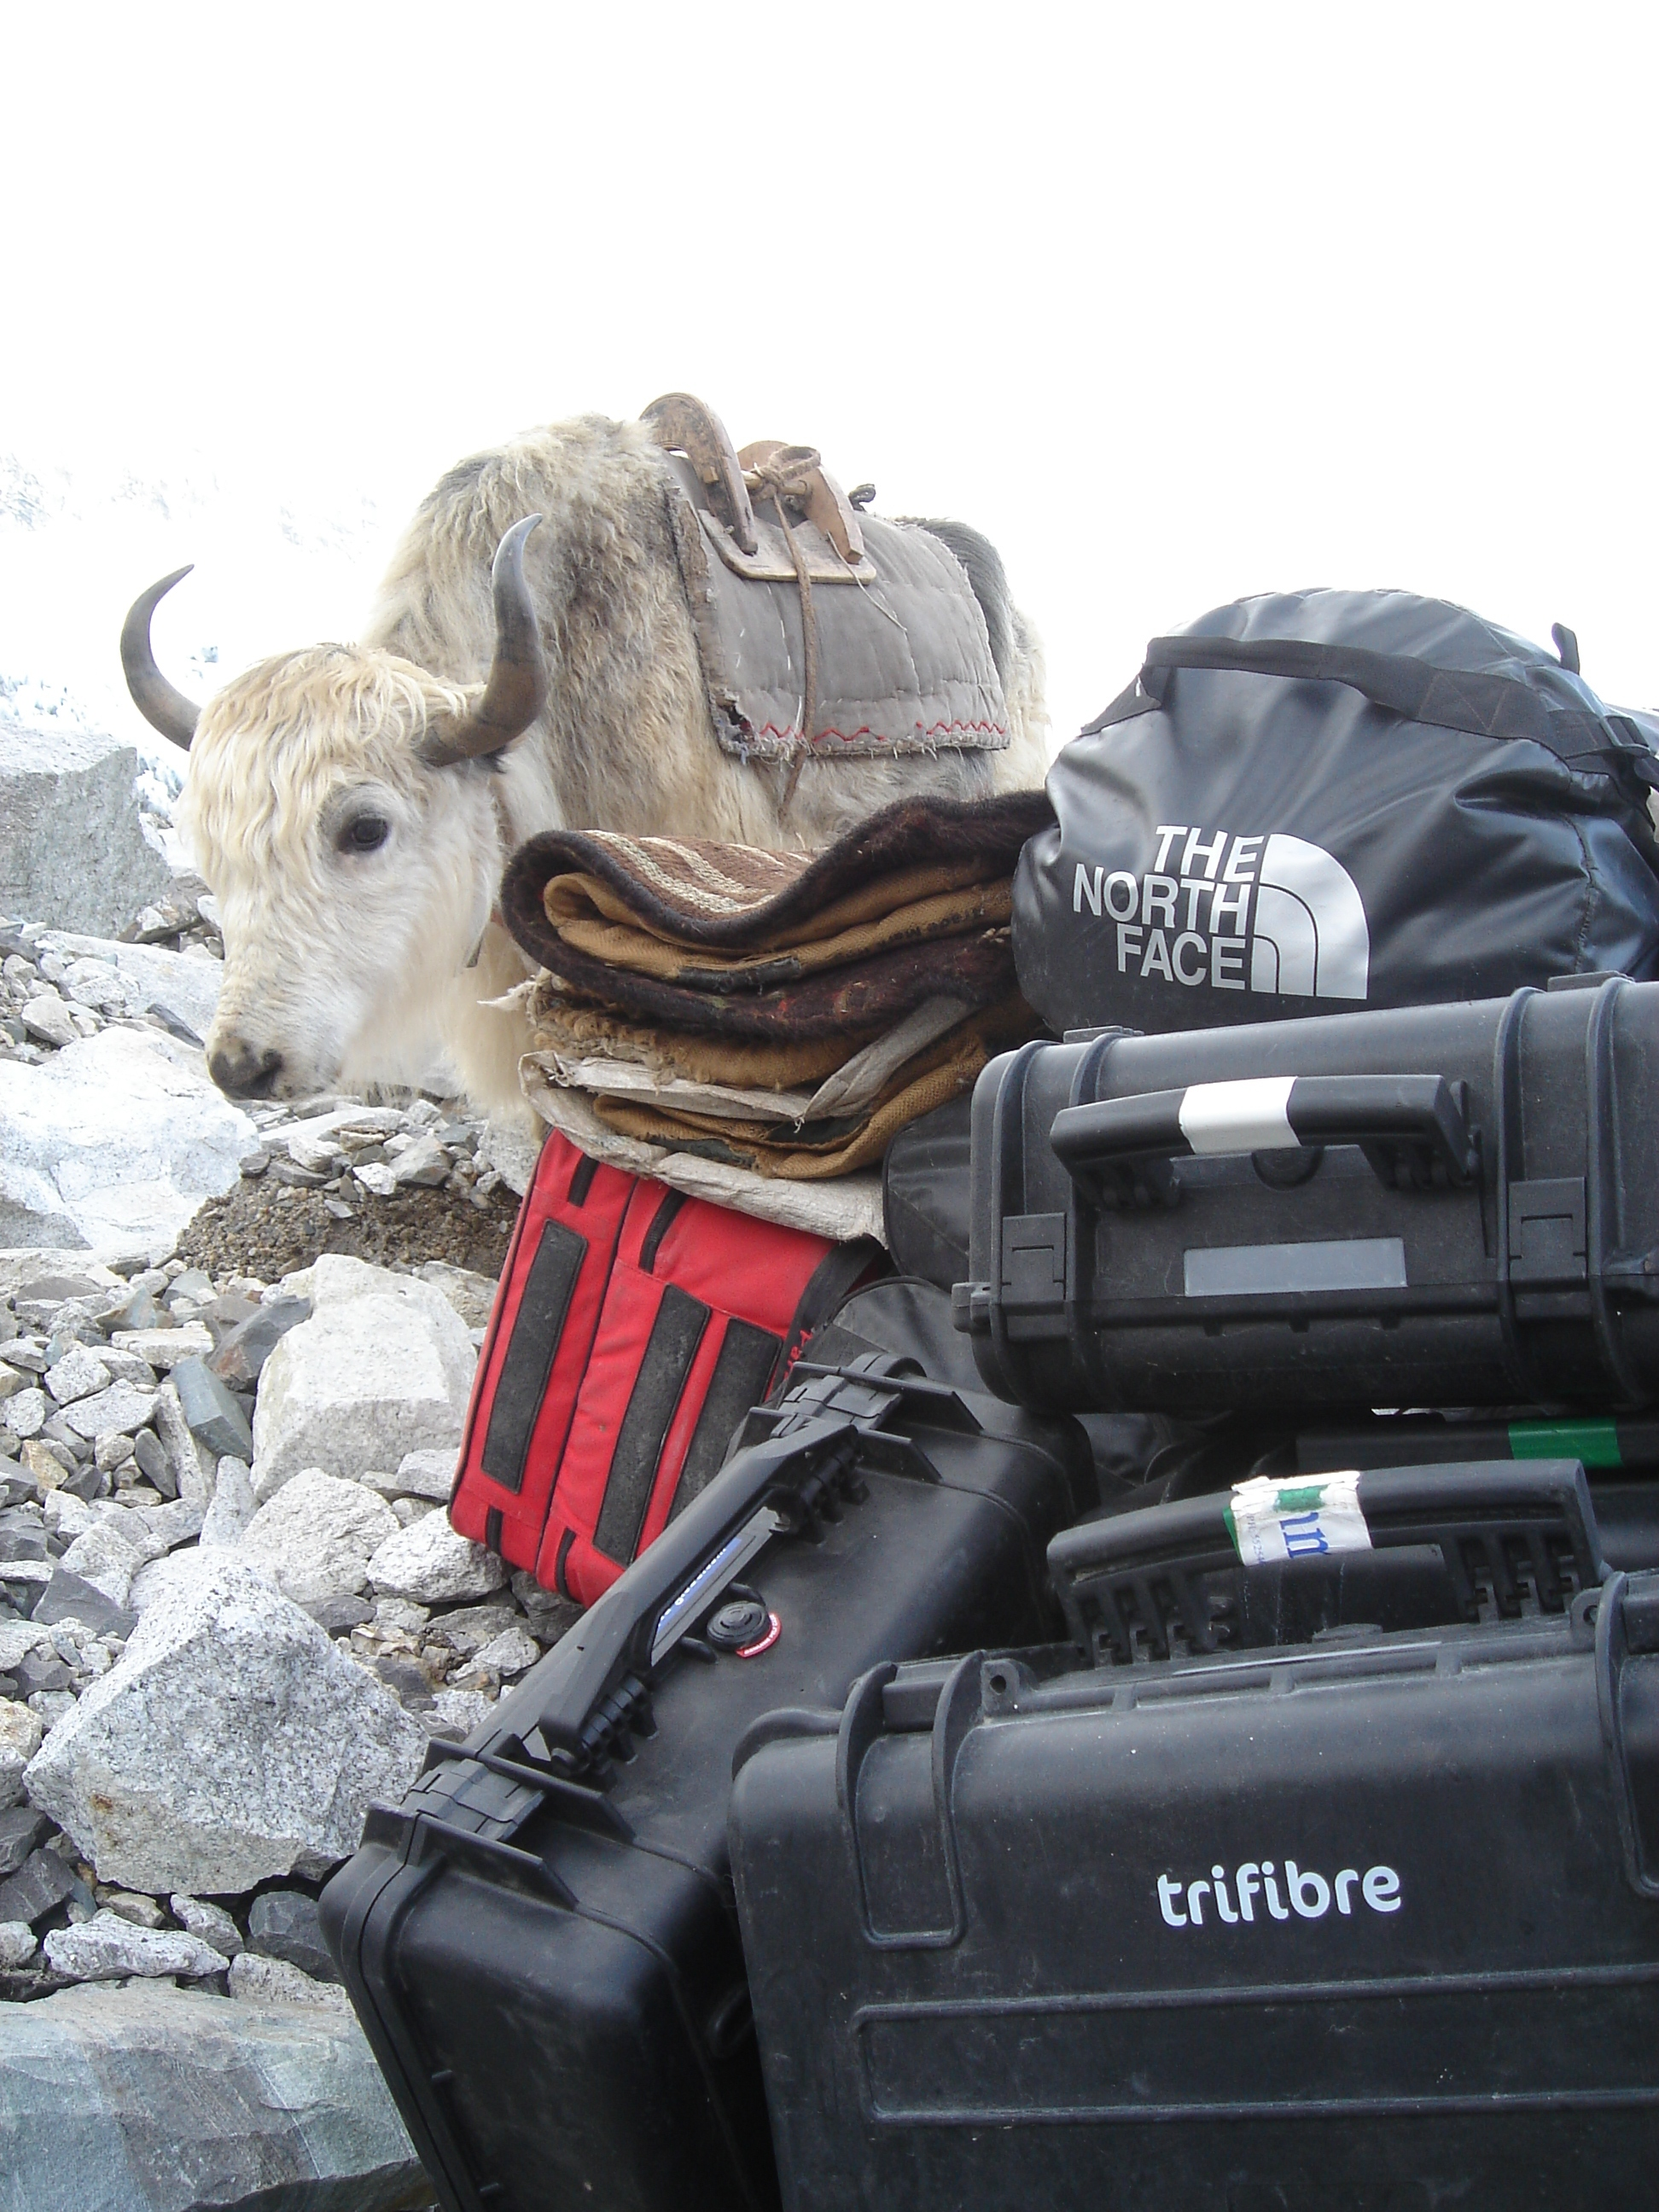 Waterproof Cases on Everest